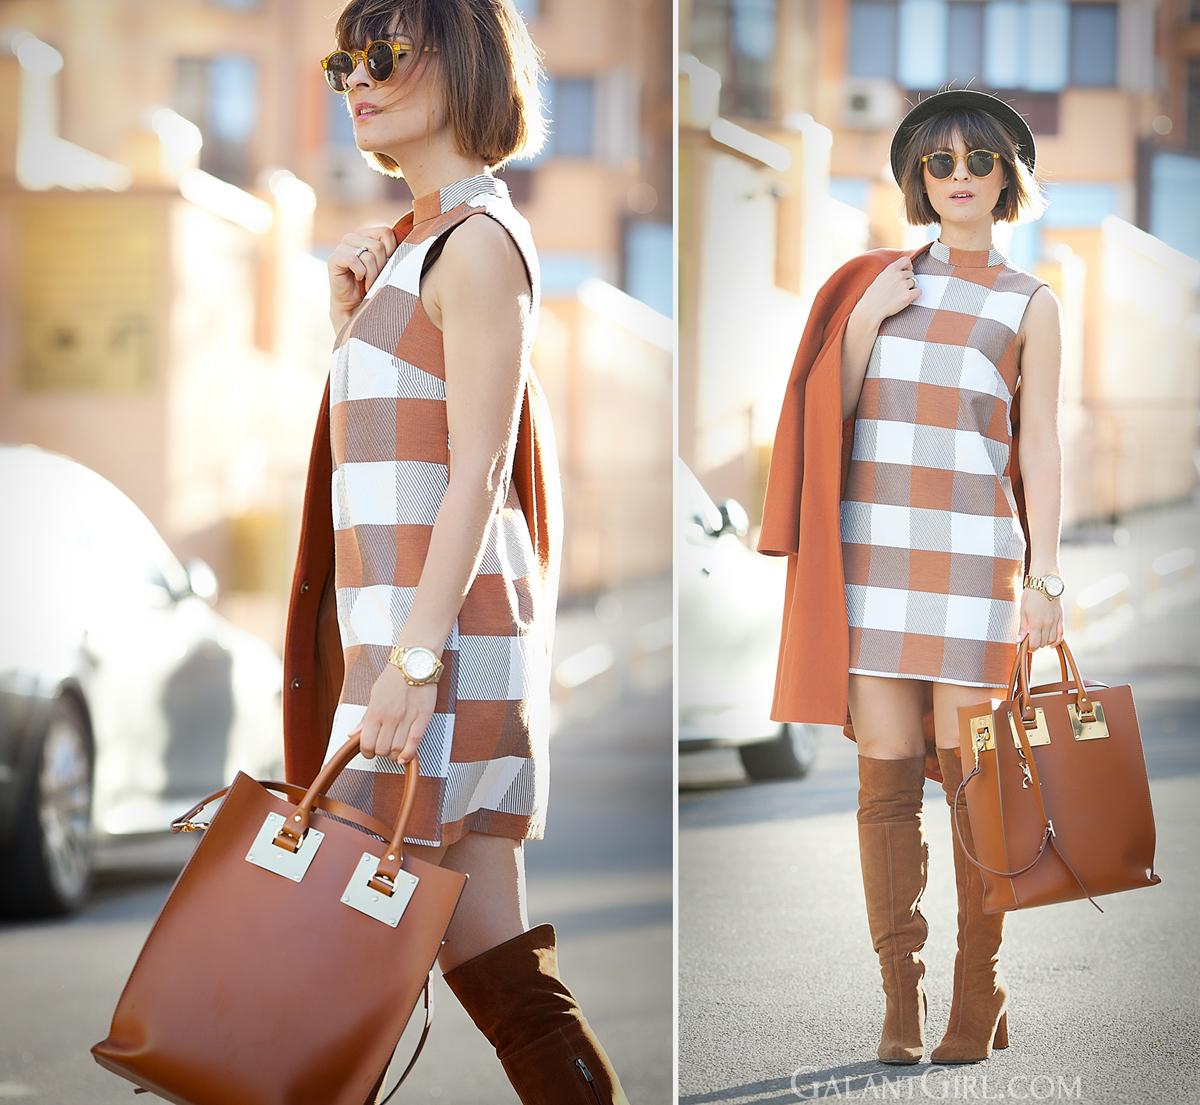 asos shift dress and sophie hulme tote bag